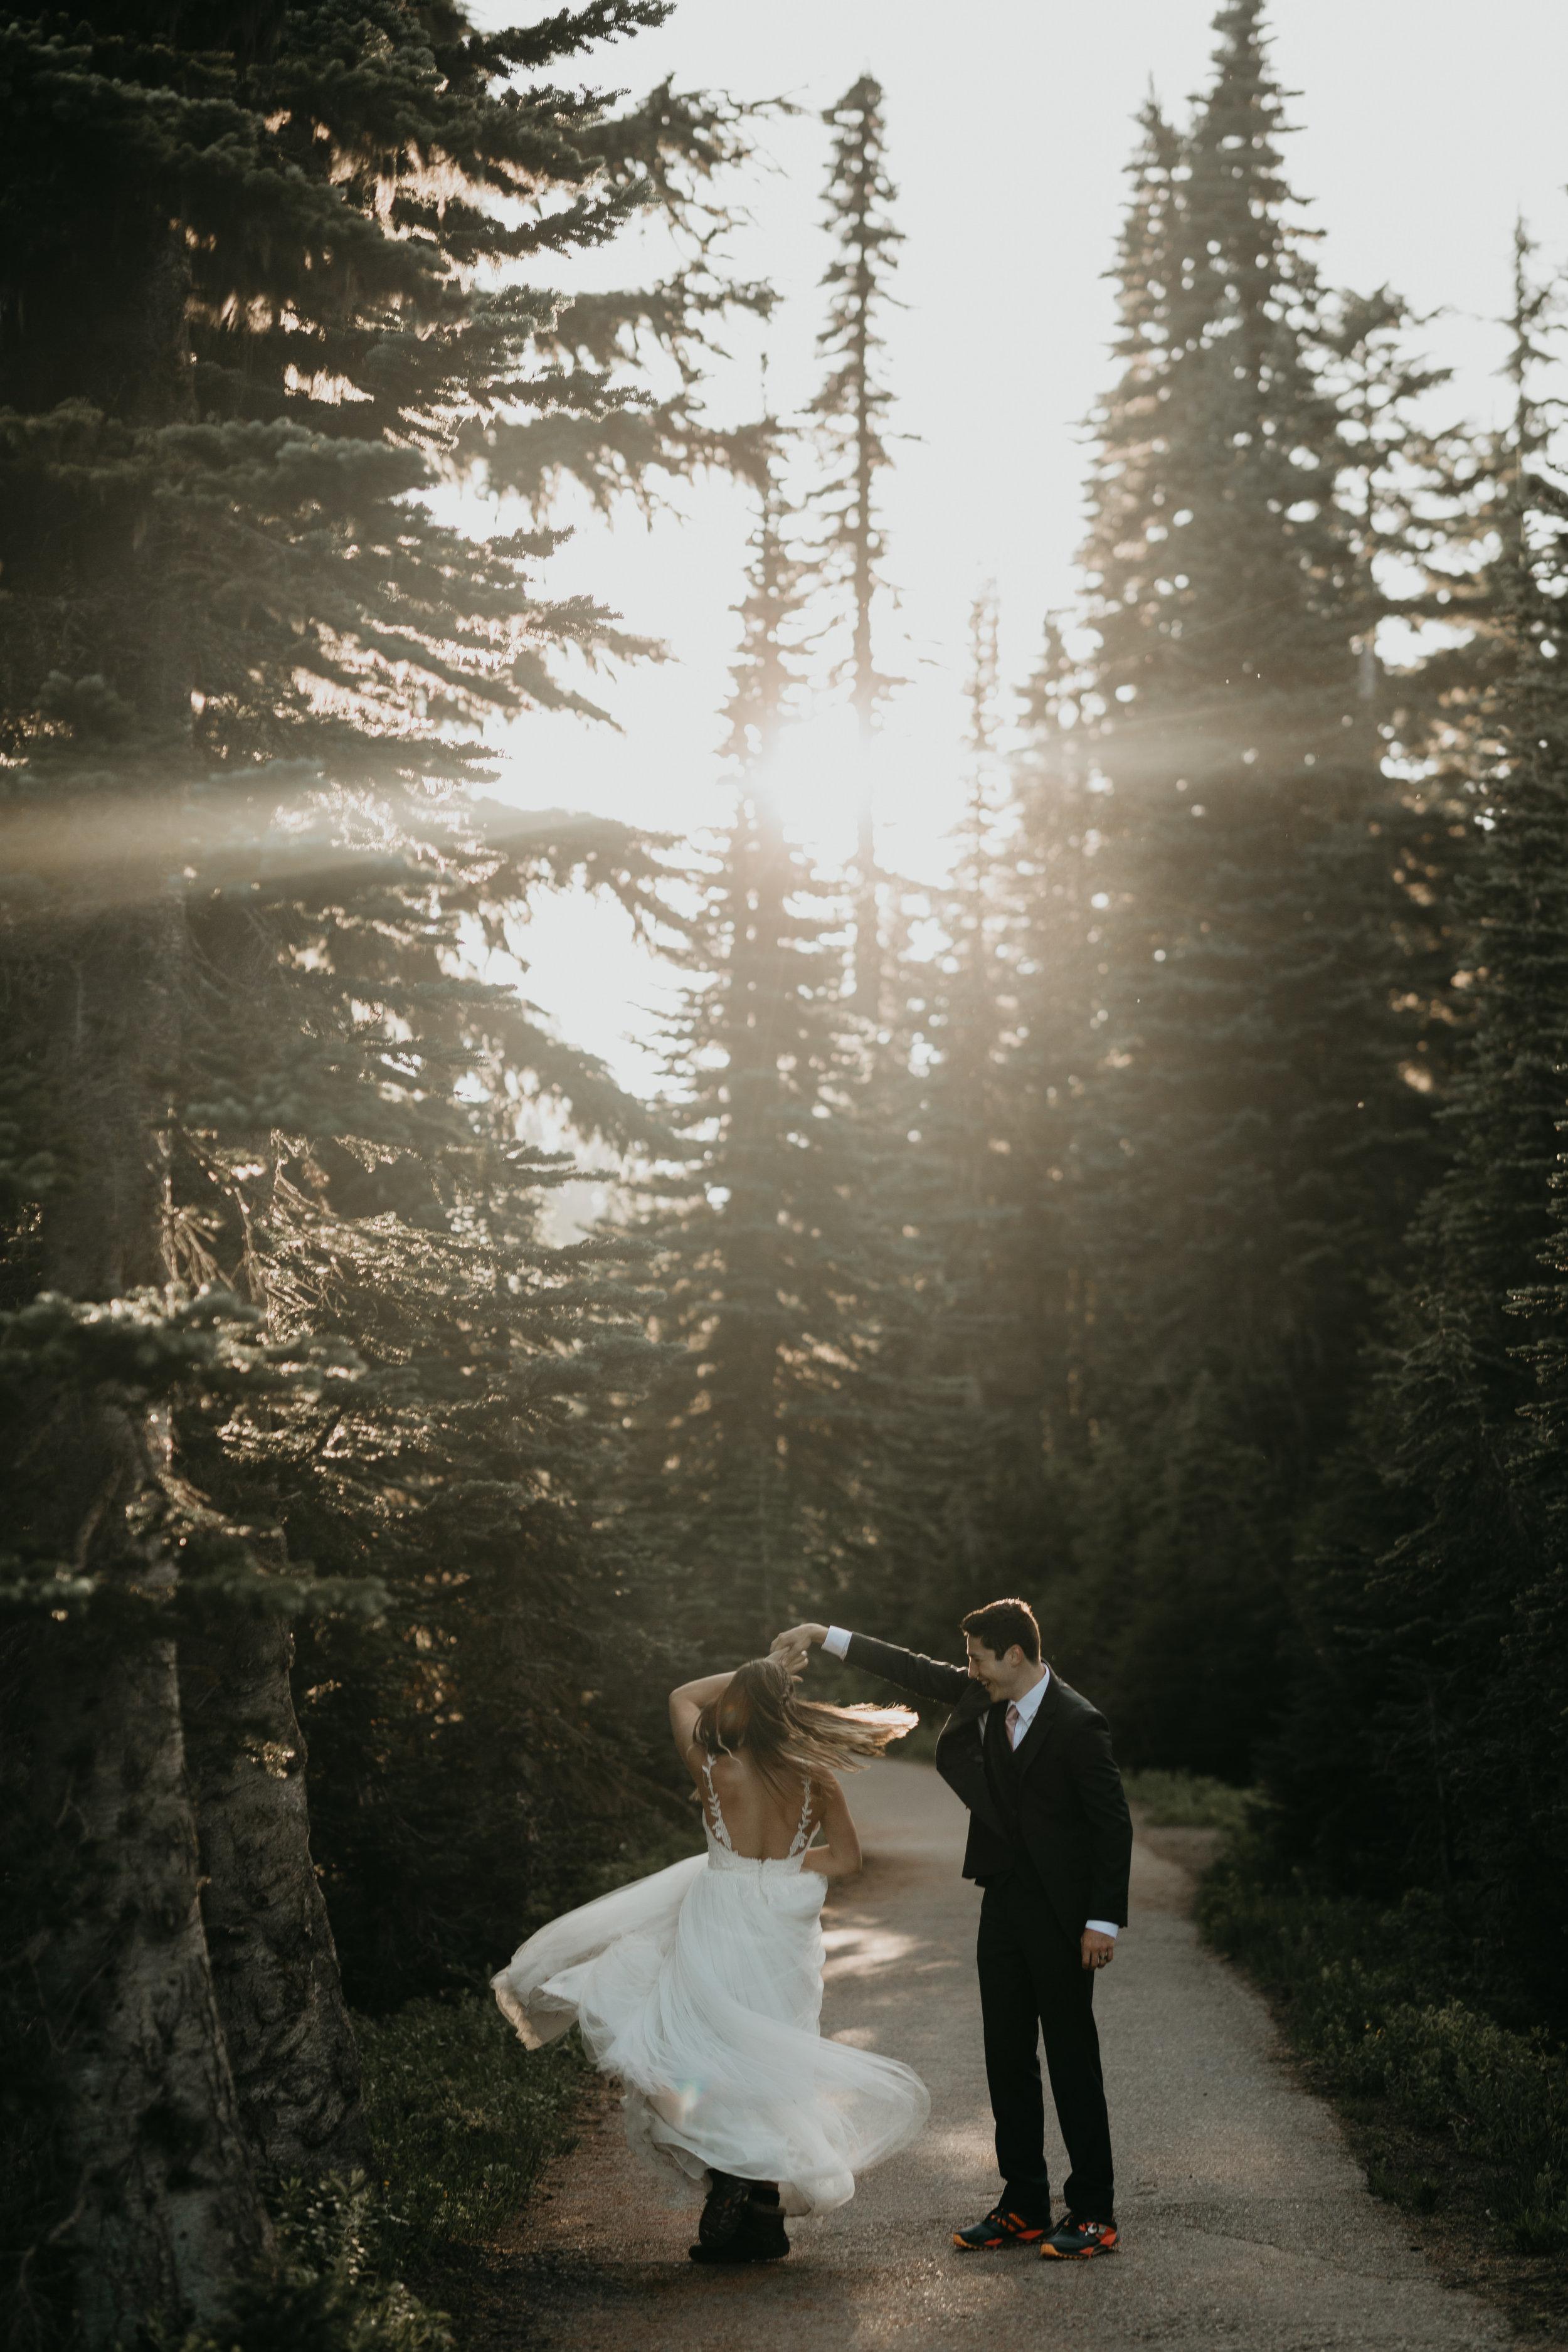 Nicole-Daacke-Photography-Mt-Rainier-elopement-photographer-washington-mountain-epic-wedding-photography-wildflowers-at-rainier-pine-tree-cloudy-summer-day-at-mountain-rainier-25.jpg